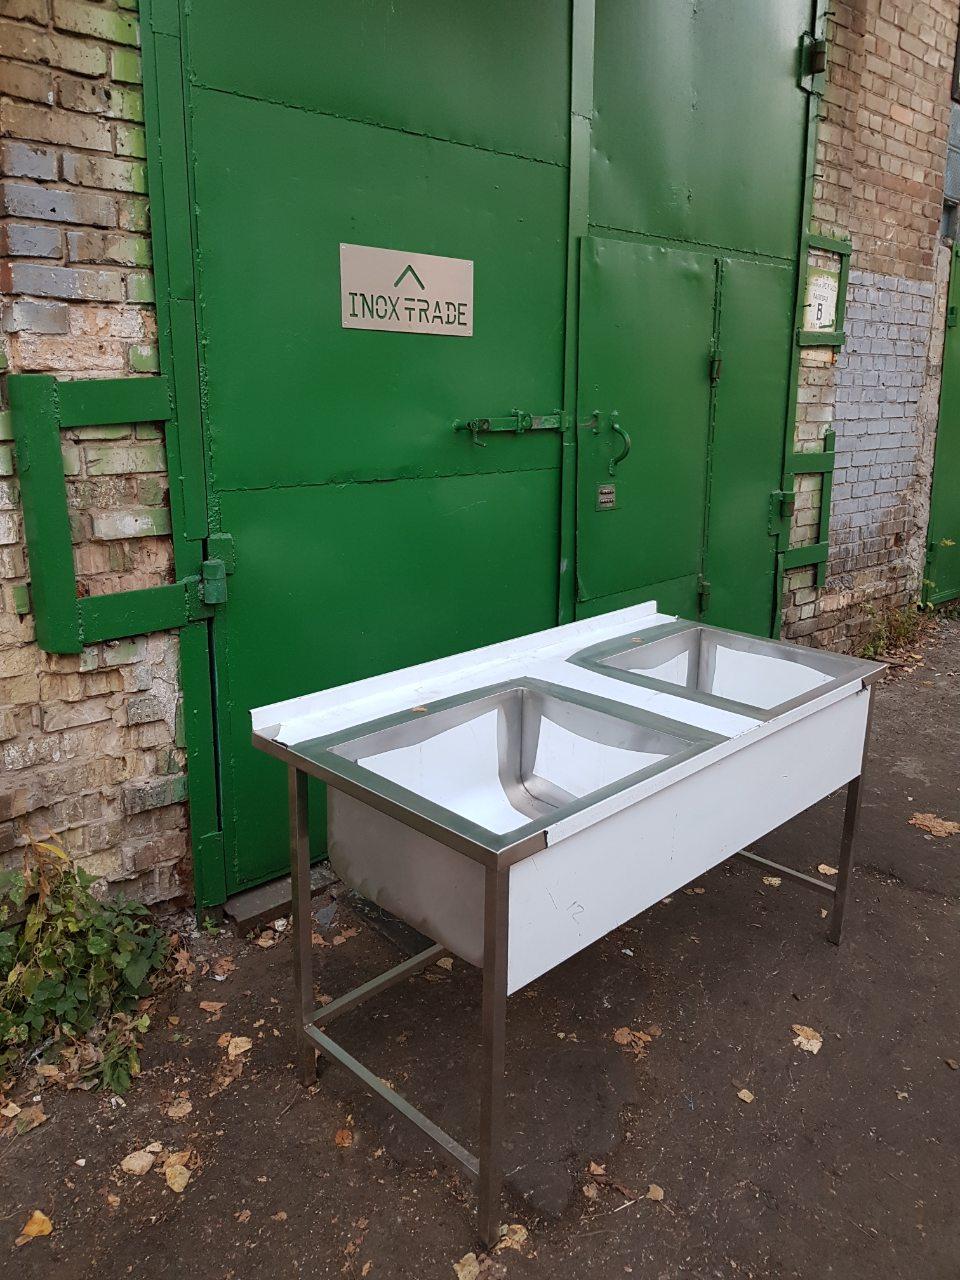 Ванна моечная 2-х секционная (1300 x 600 x 850) - фотография №2